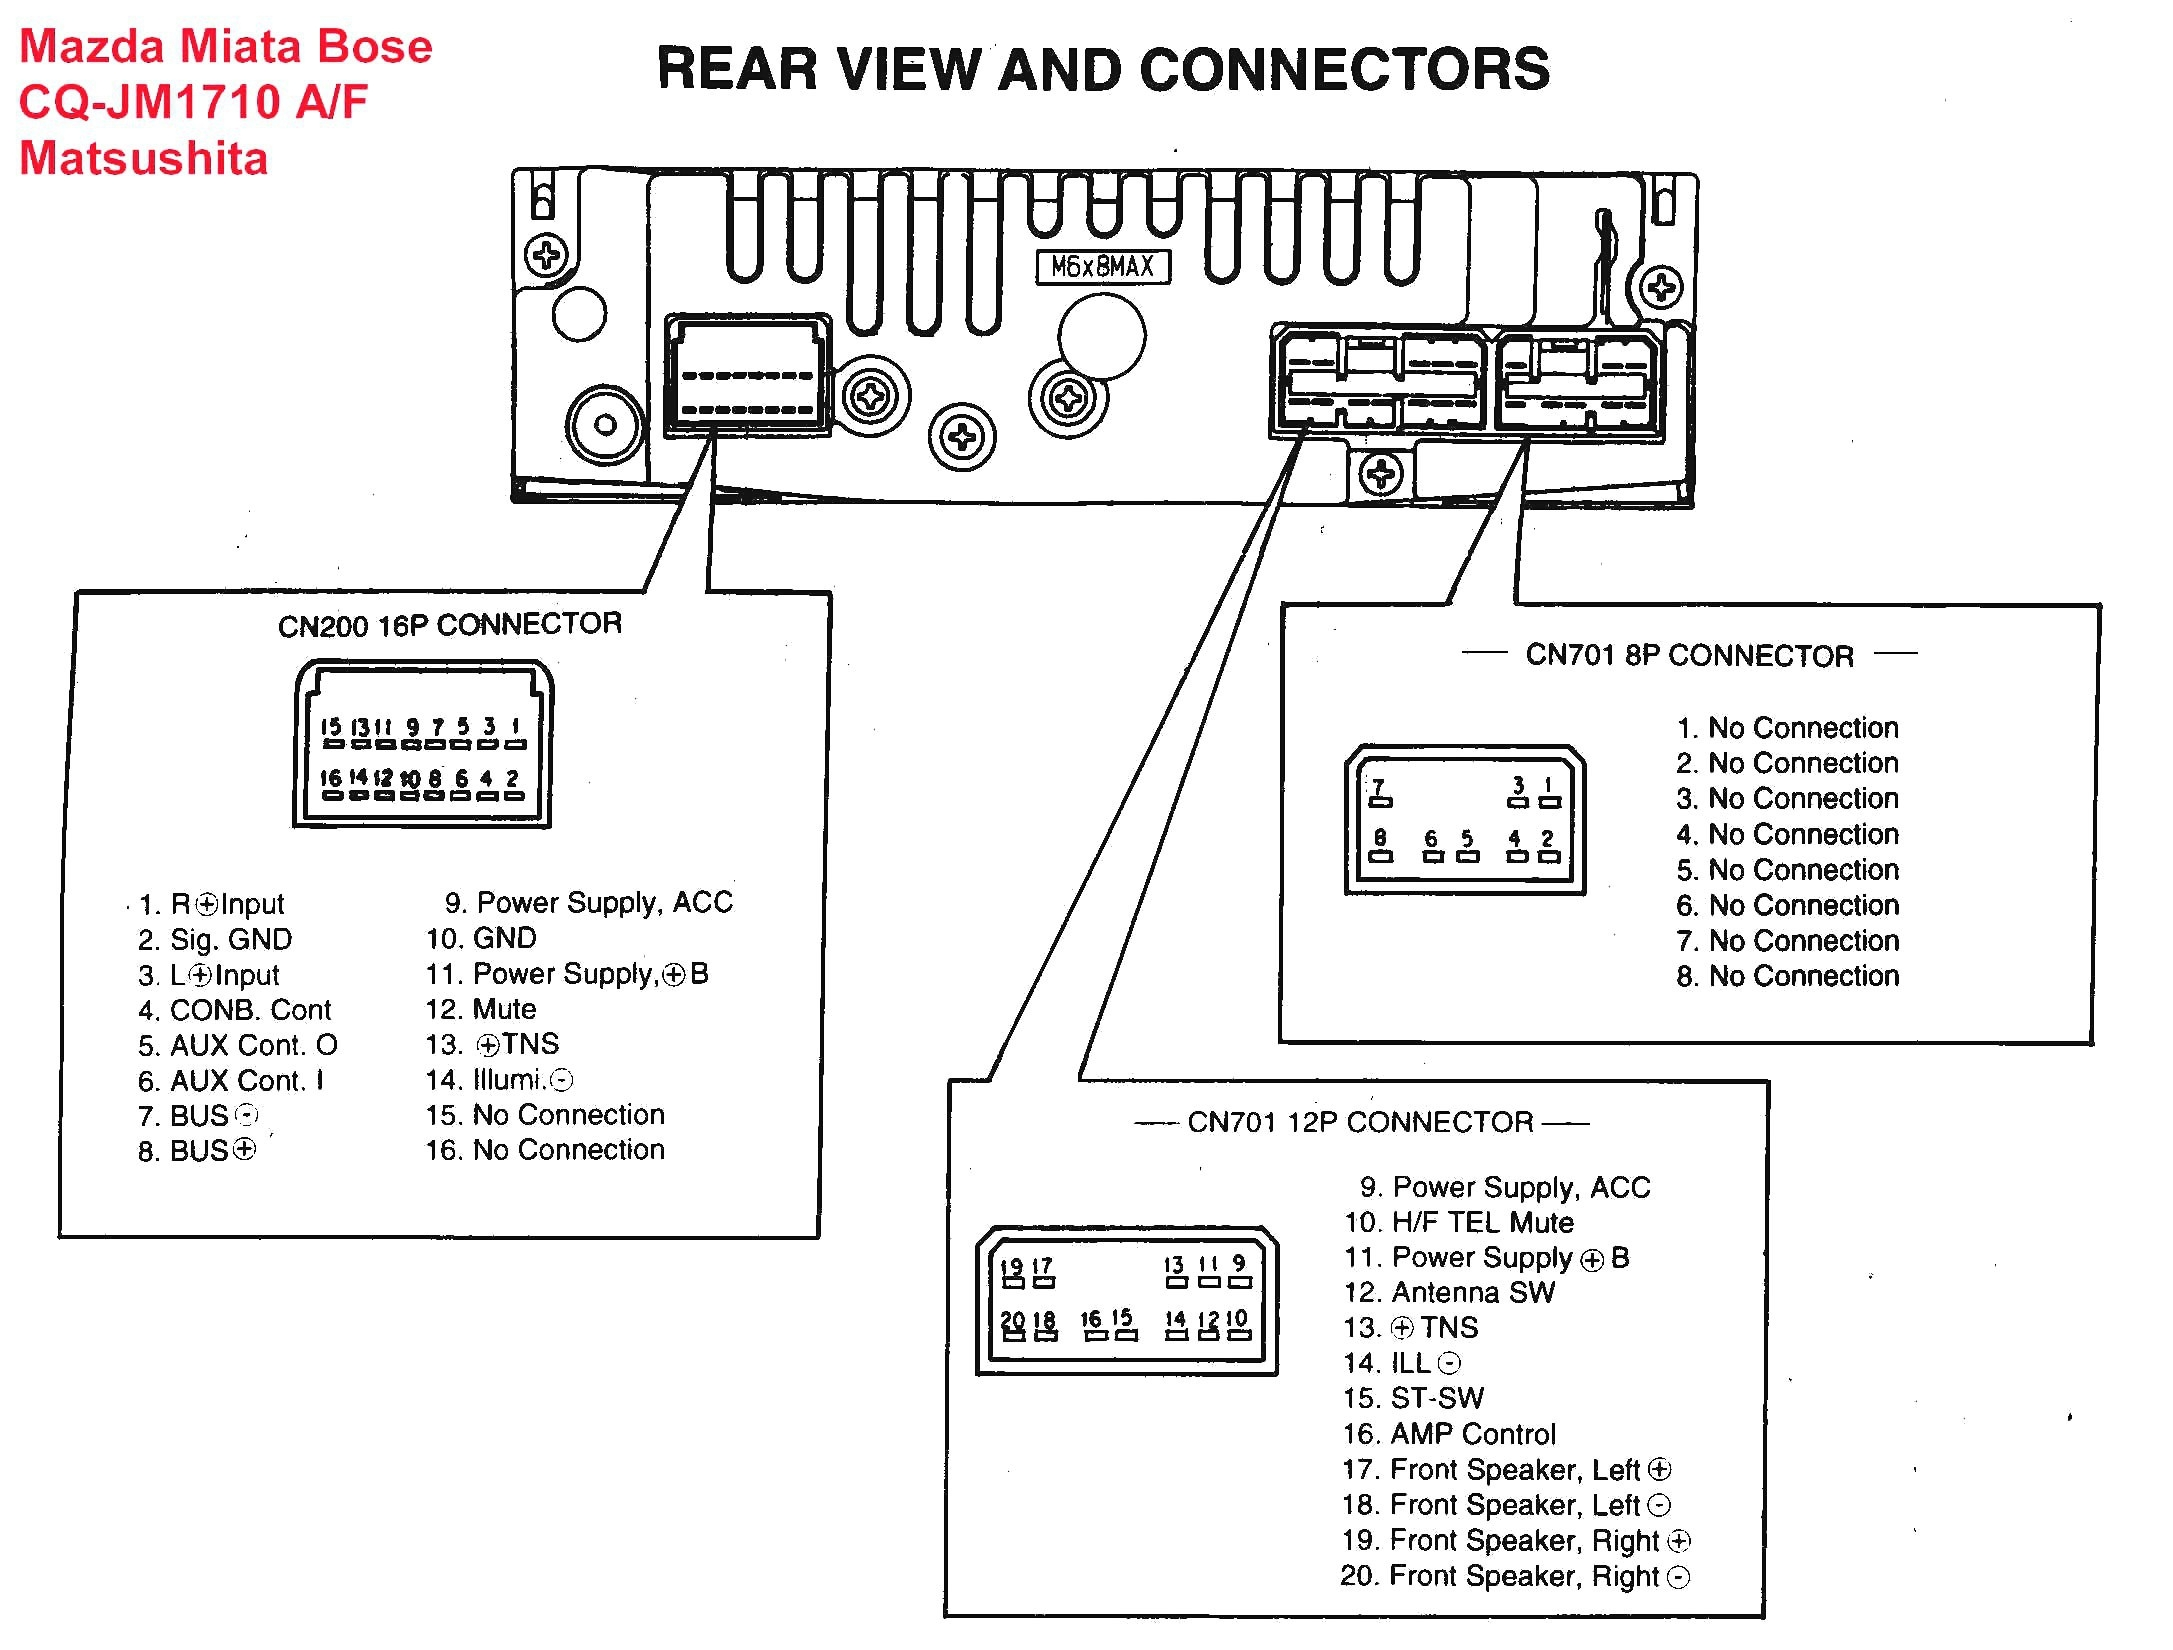 pioneer deh 150mp wiring diagram | free wiring diagram pioneer deh x56hd wiring diagram pioneer deh 6300ub wiring diagram #10